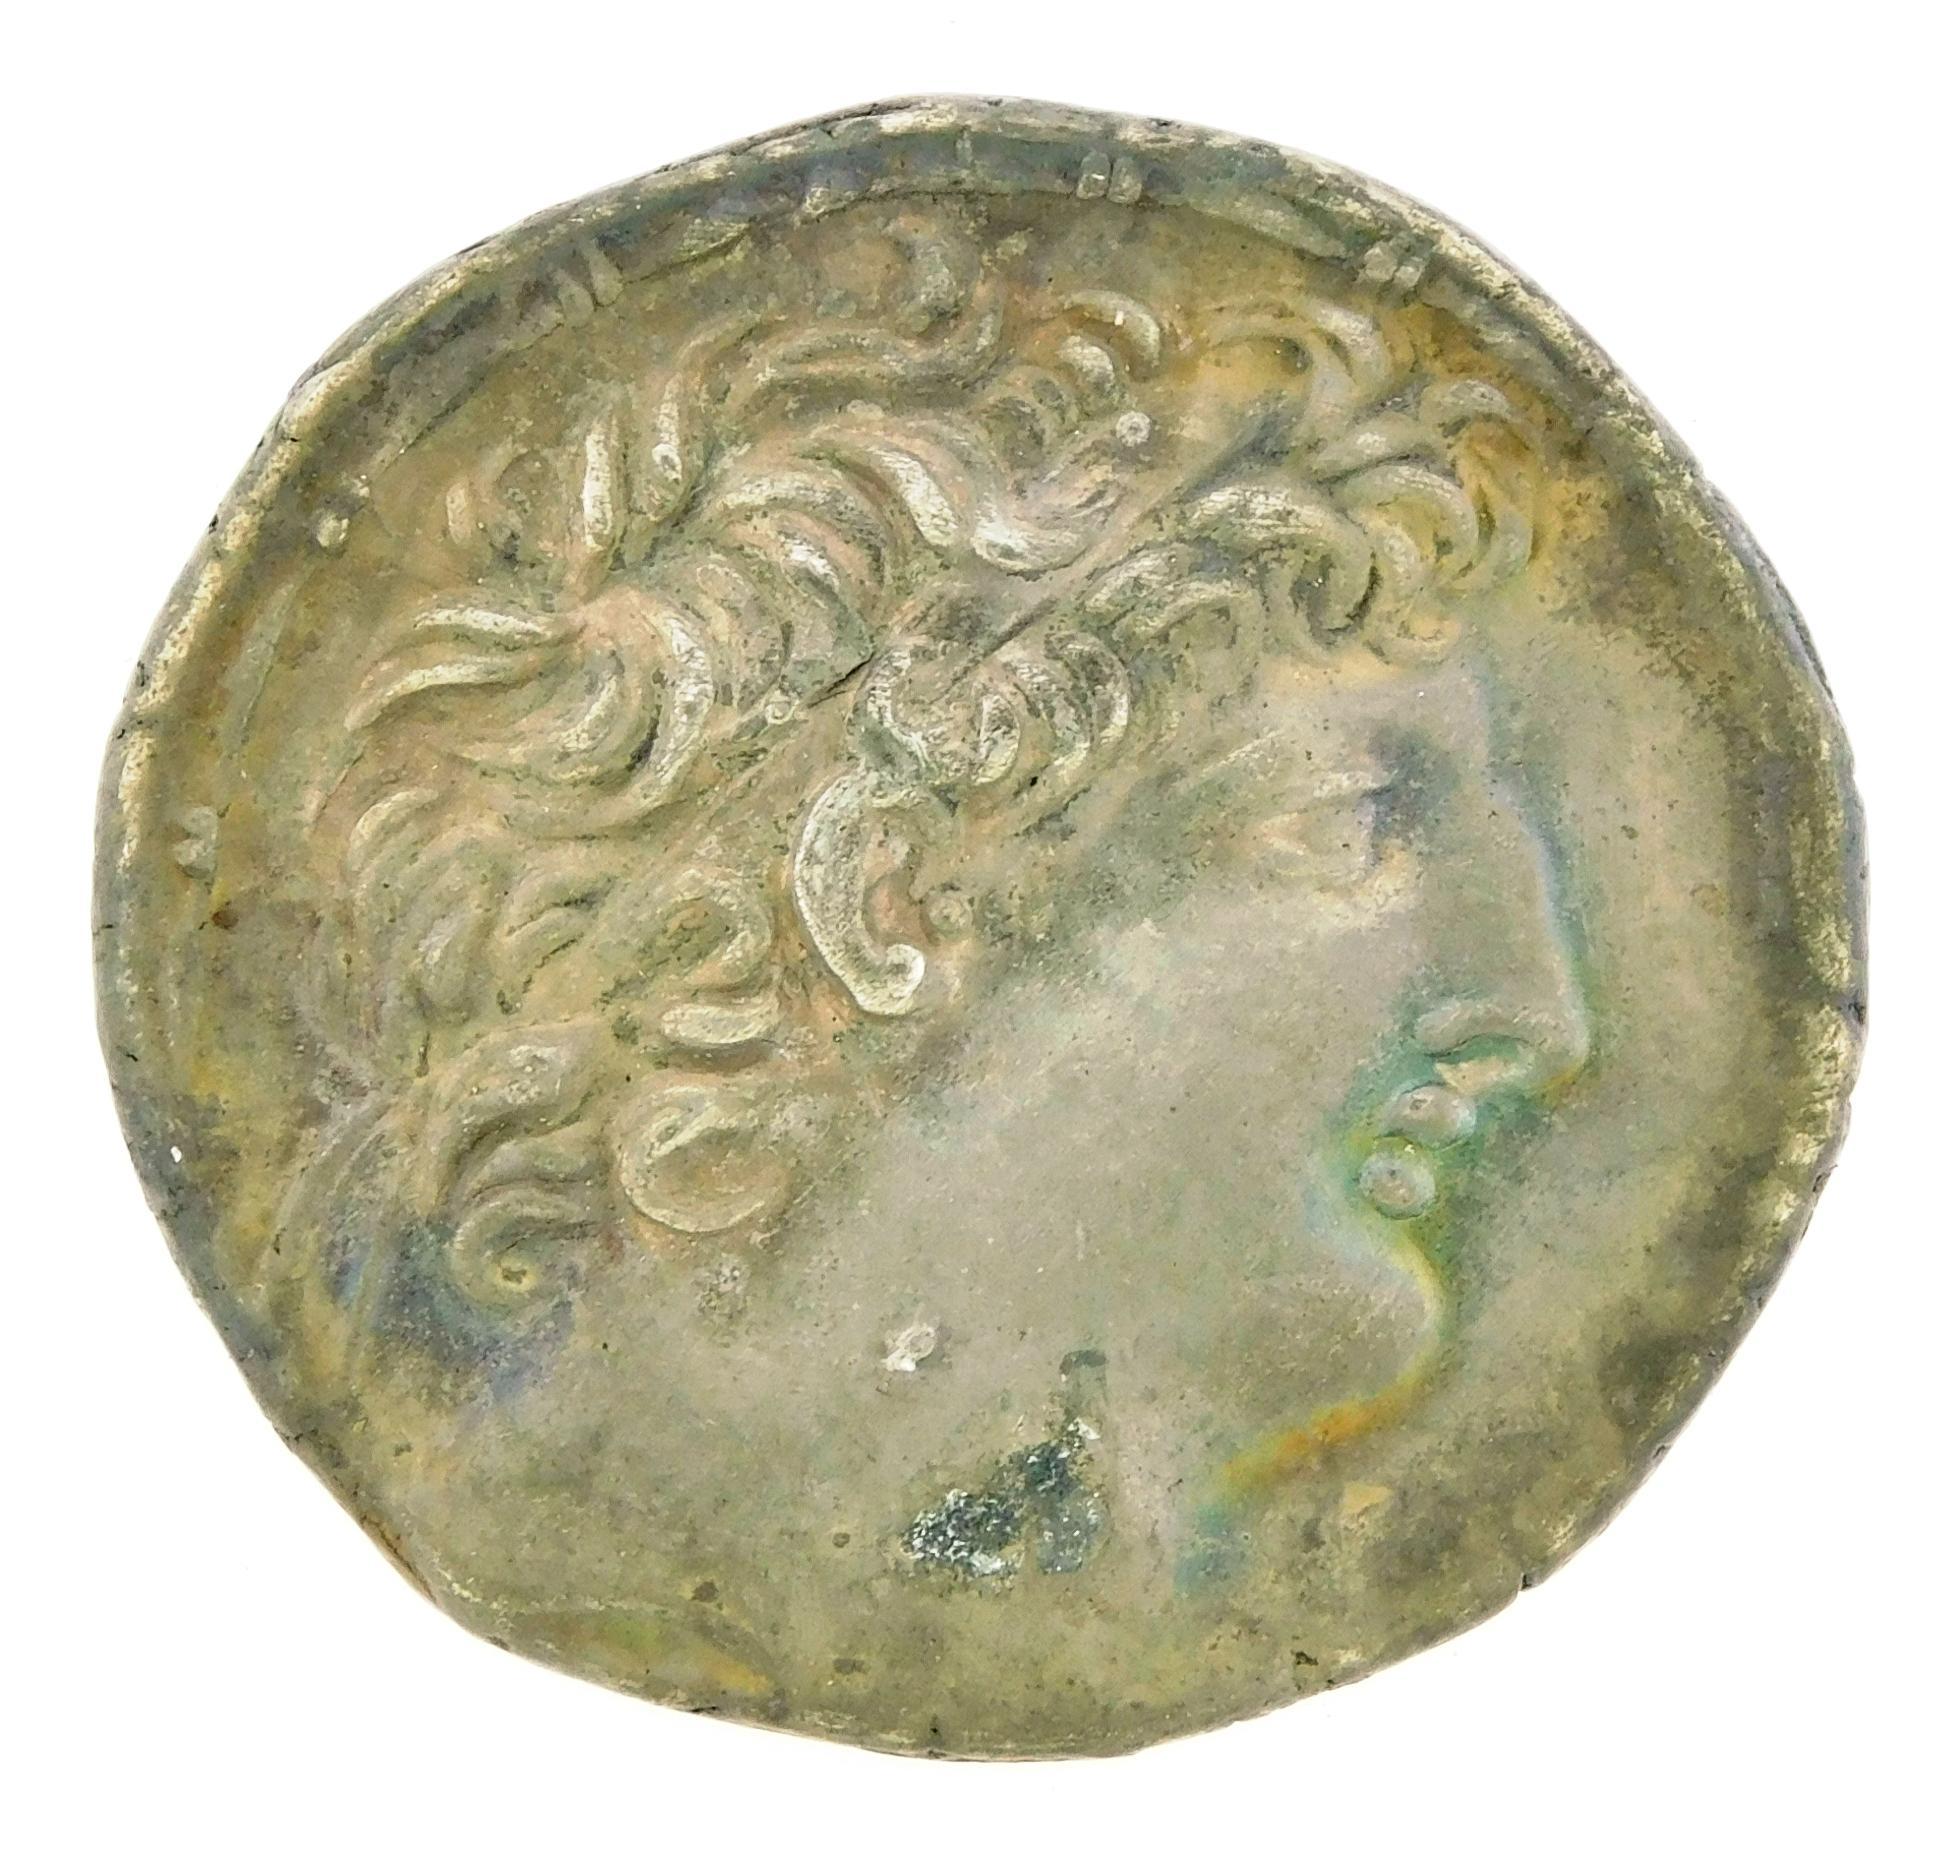 COIN: Seleukid Empire. Circa 121-113 BC Antiochos VIII Epiphanes AR Tetradrachm. Zeus standing left. gEF. 16.46 Grams, 30.1mm [Discl...